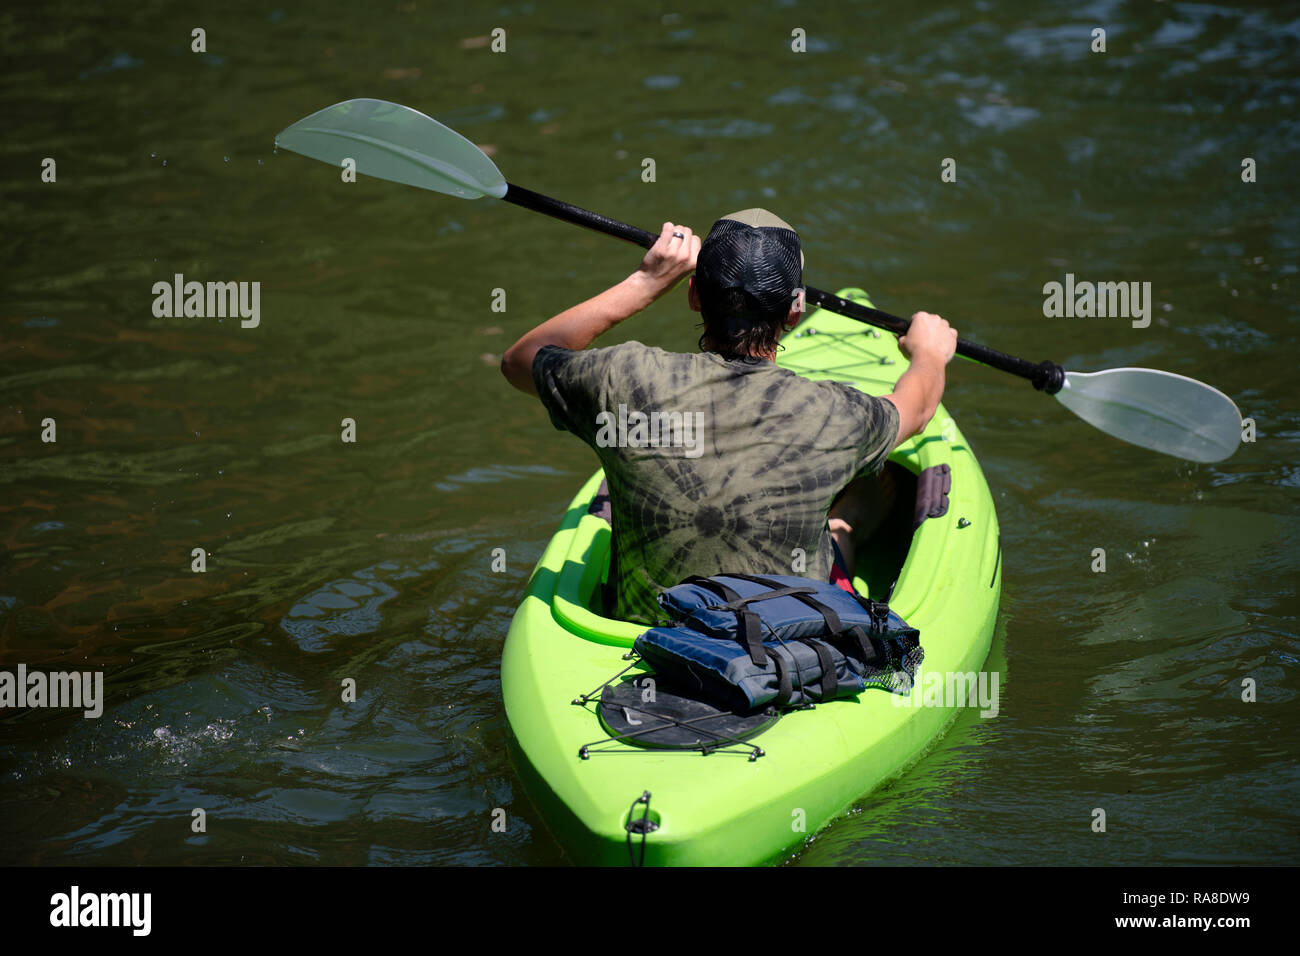 Lacamas Lake Stock Photos & Lacamas Lake Stock Images - Alamy